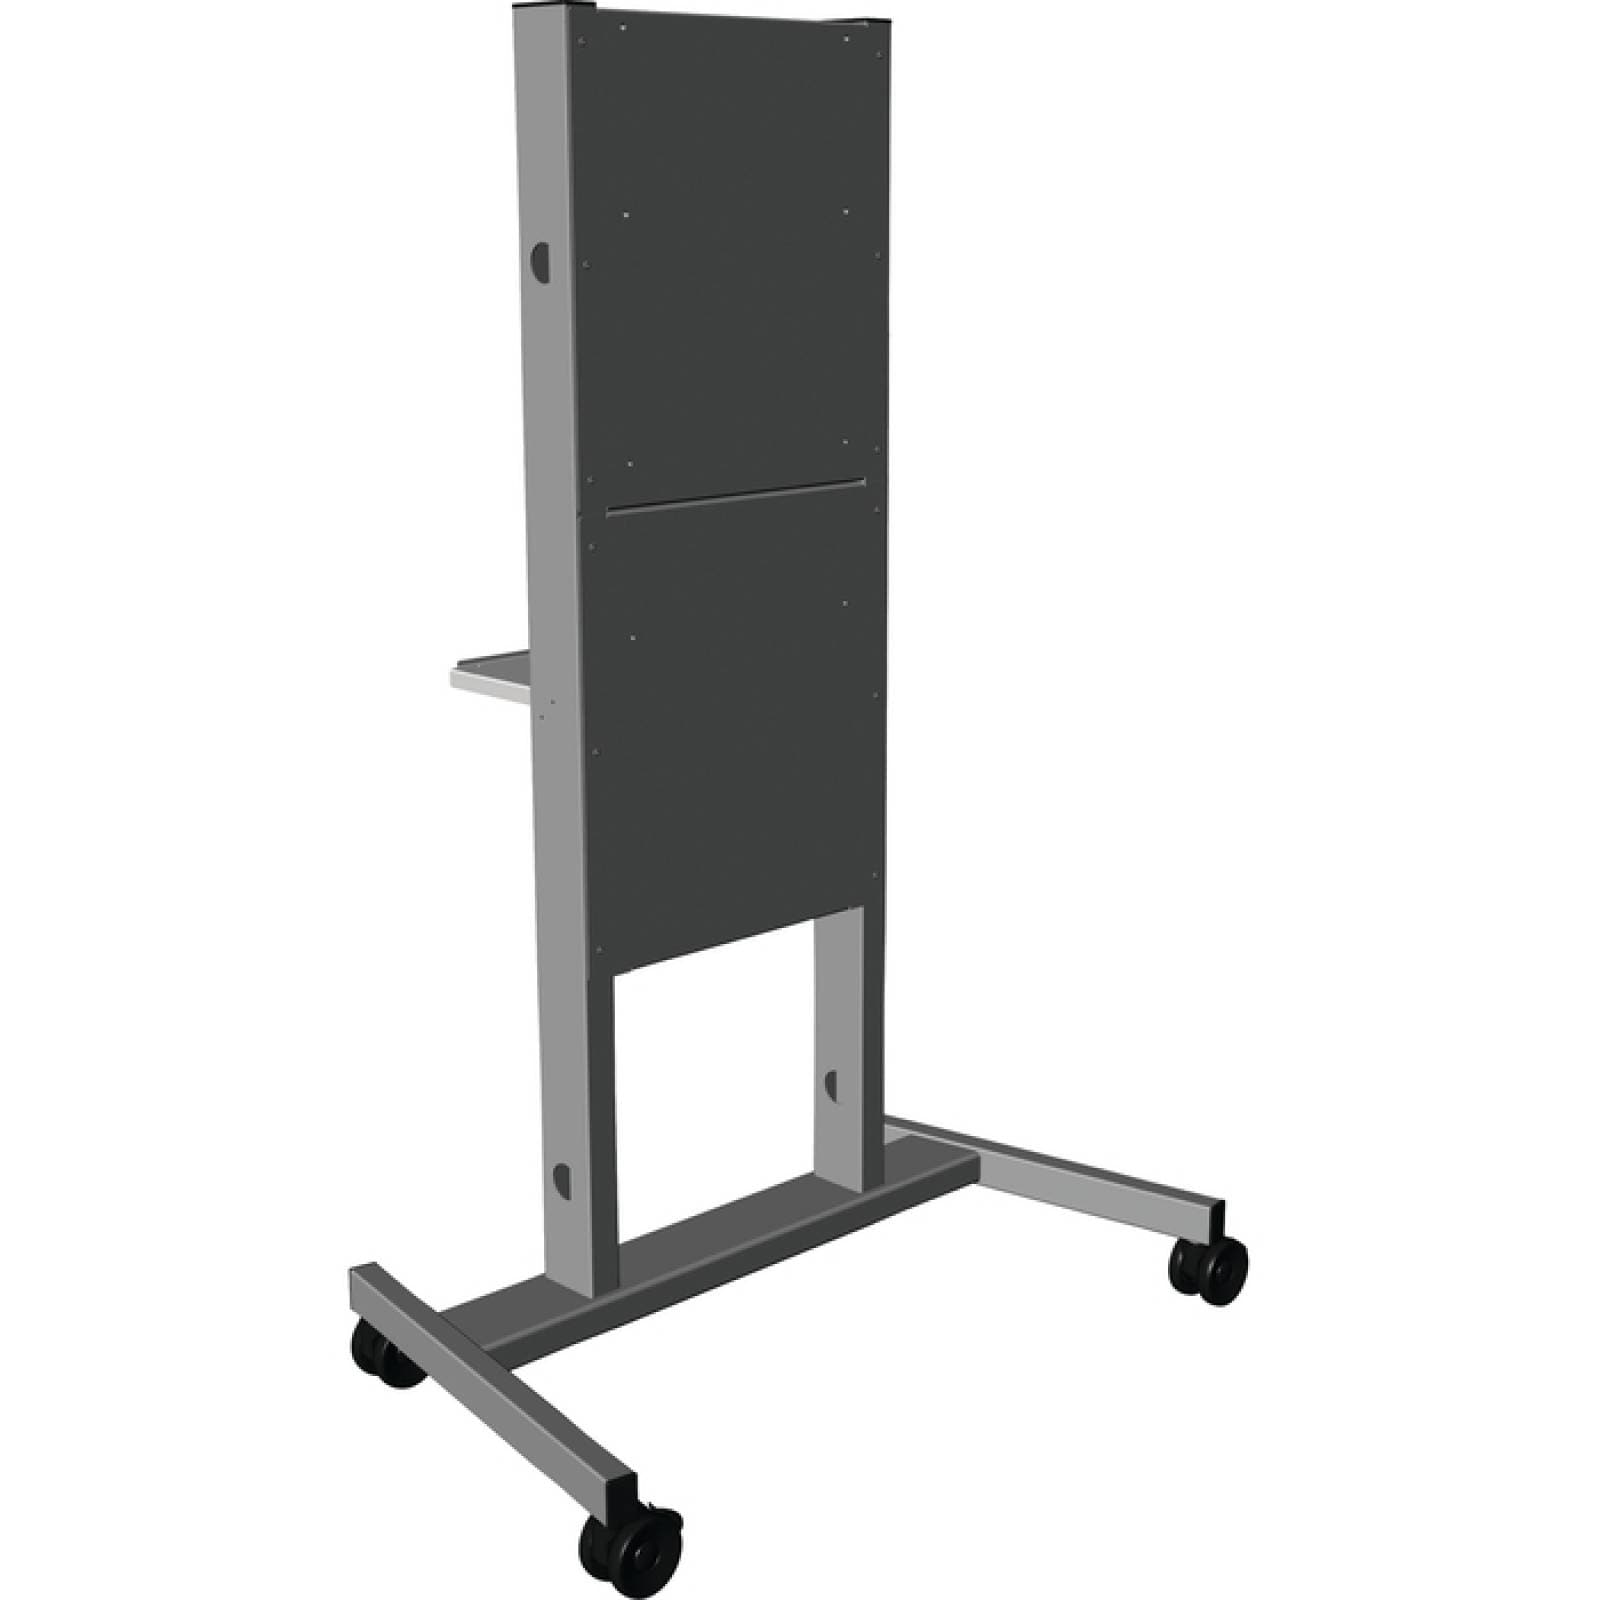 Carro mvil InFocus para montaje de elevacin vertical